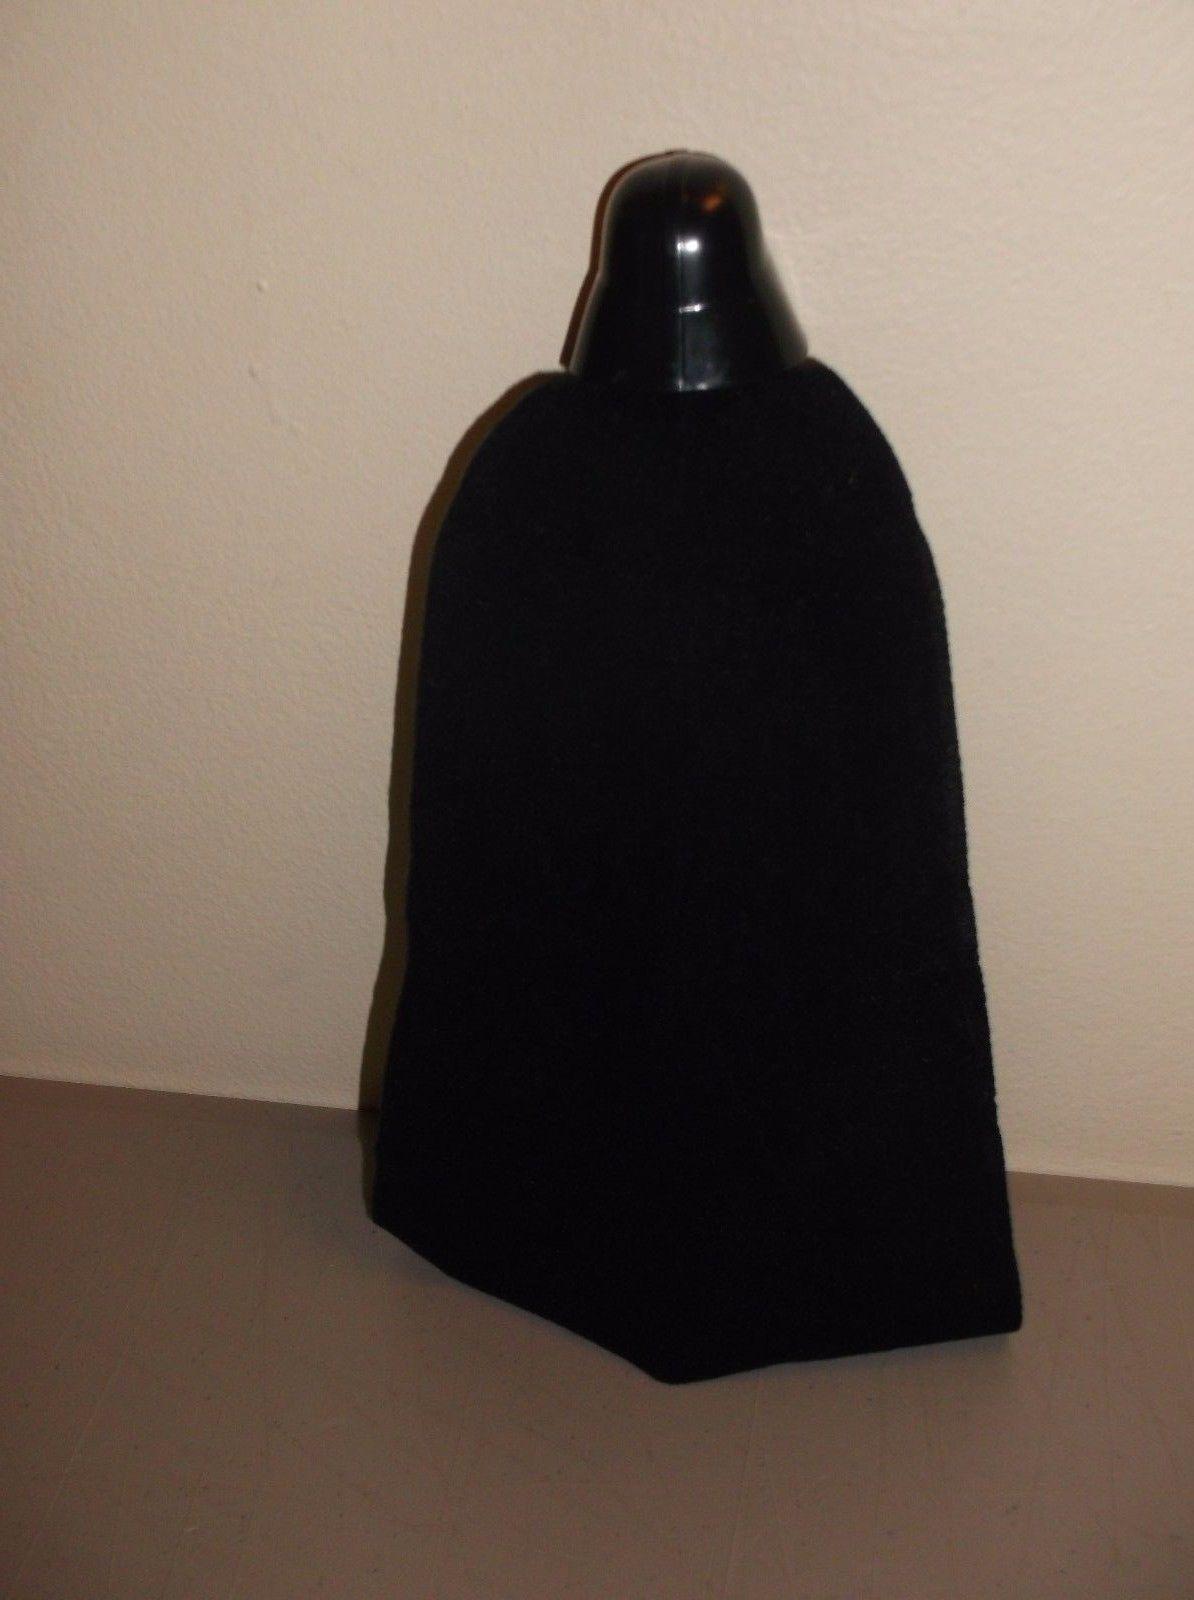 "2013 Hasbro Star Wars Darth Vader 12"" Action Figure"